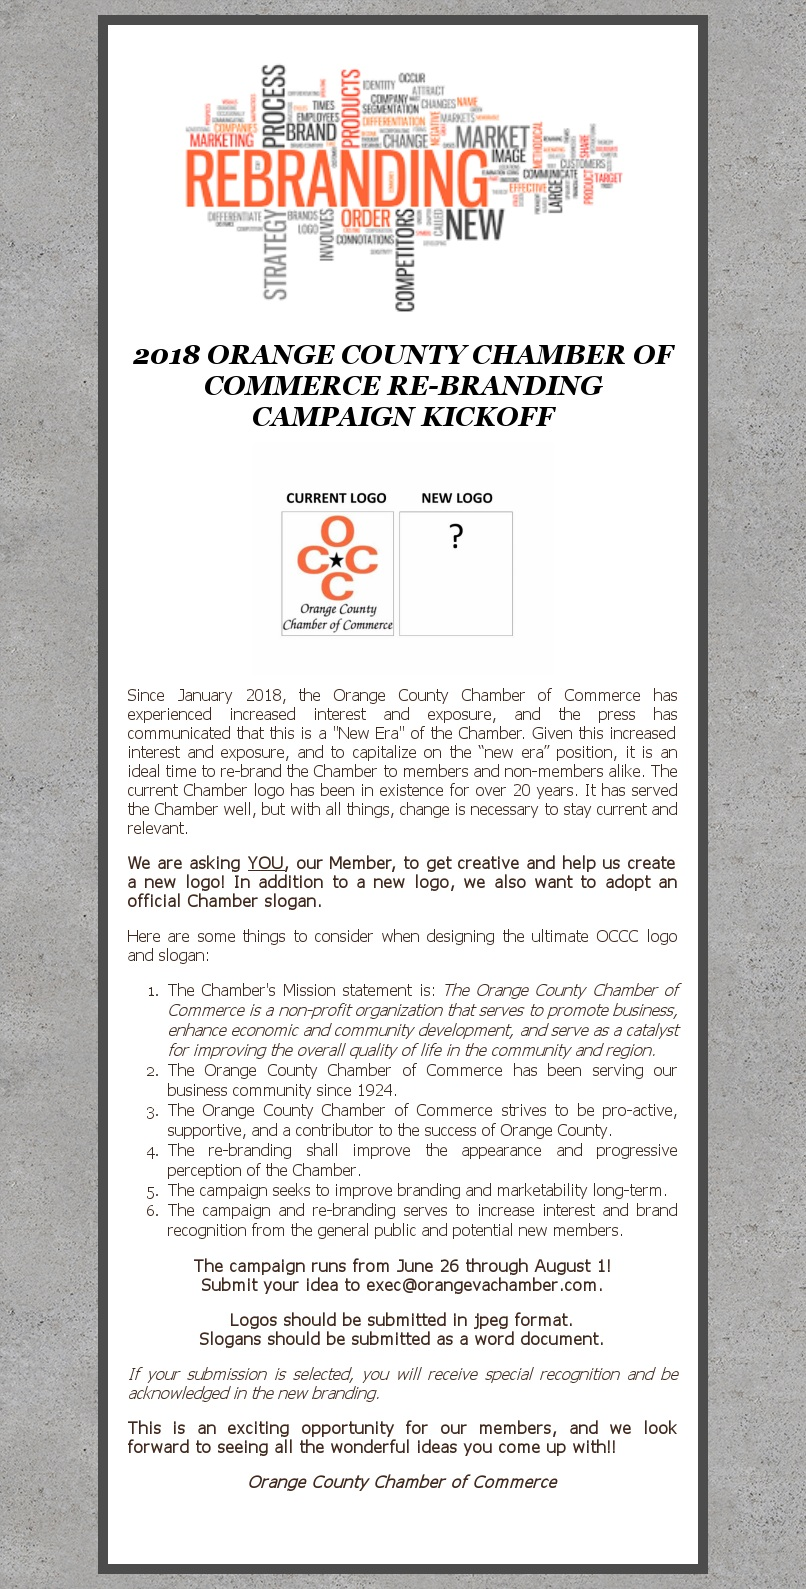 OCCC-Re-branding-Campaign-2018.jpg